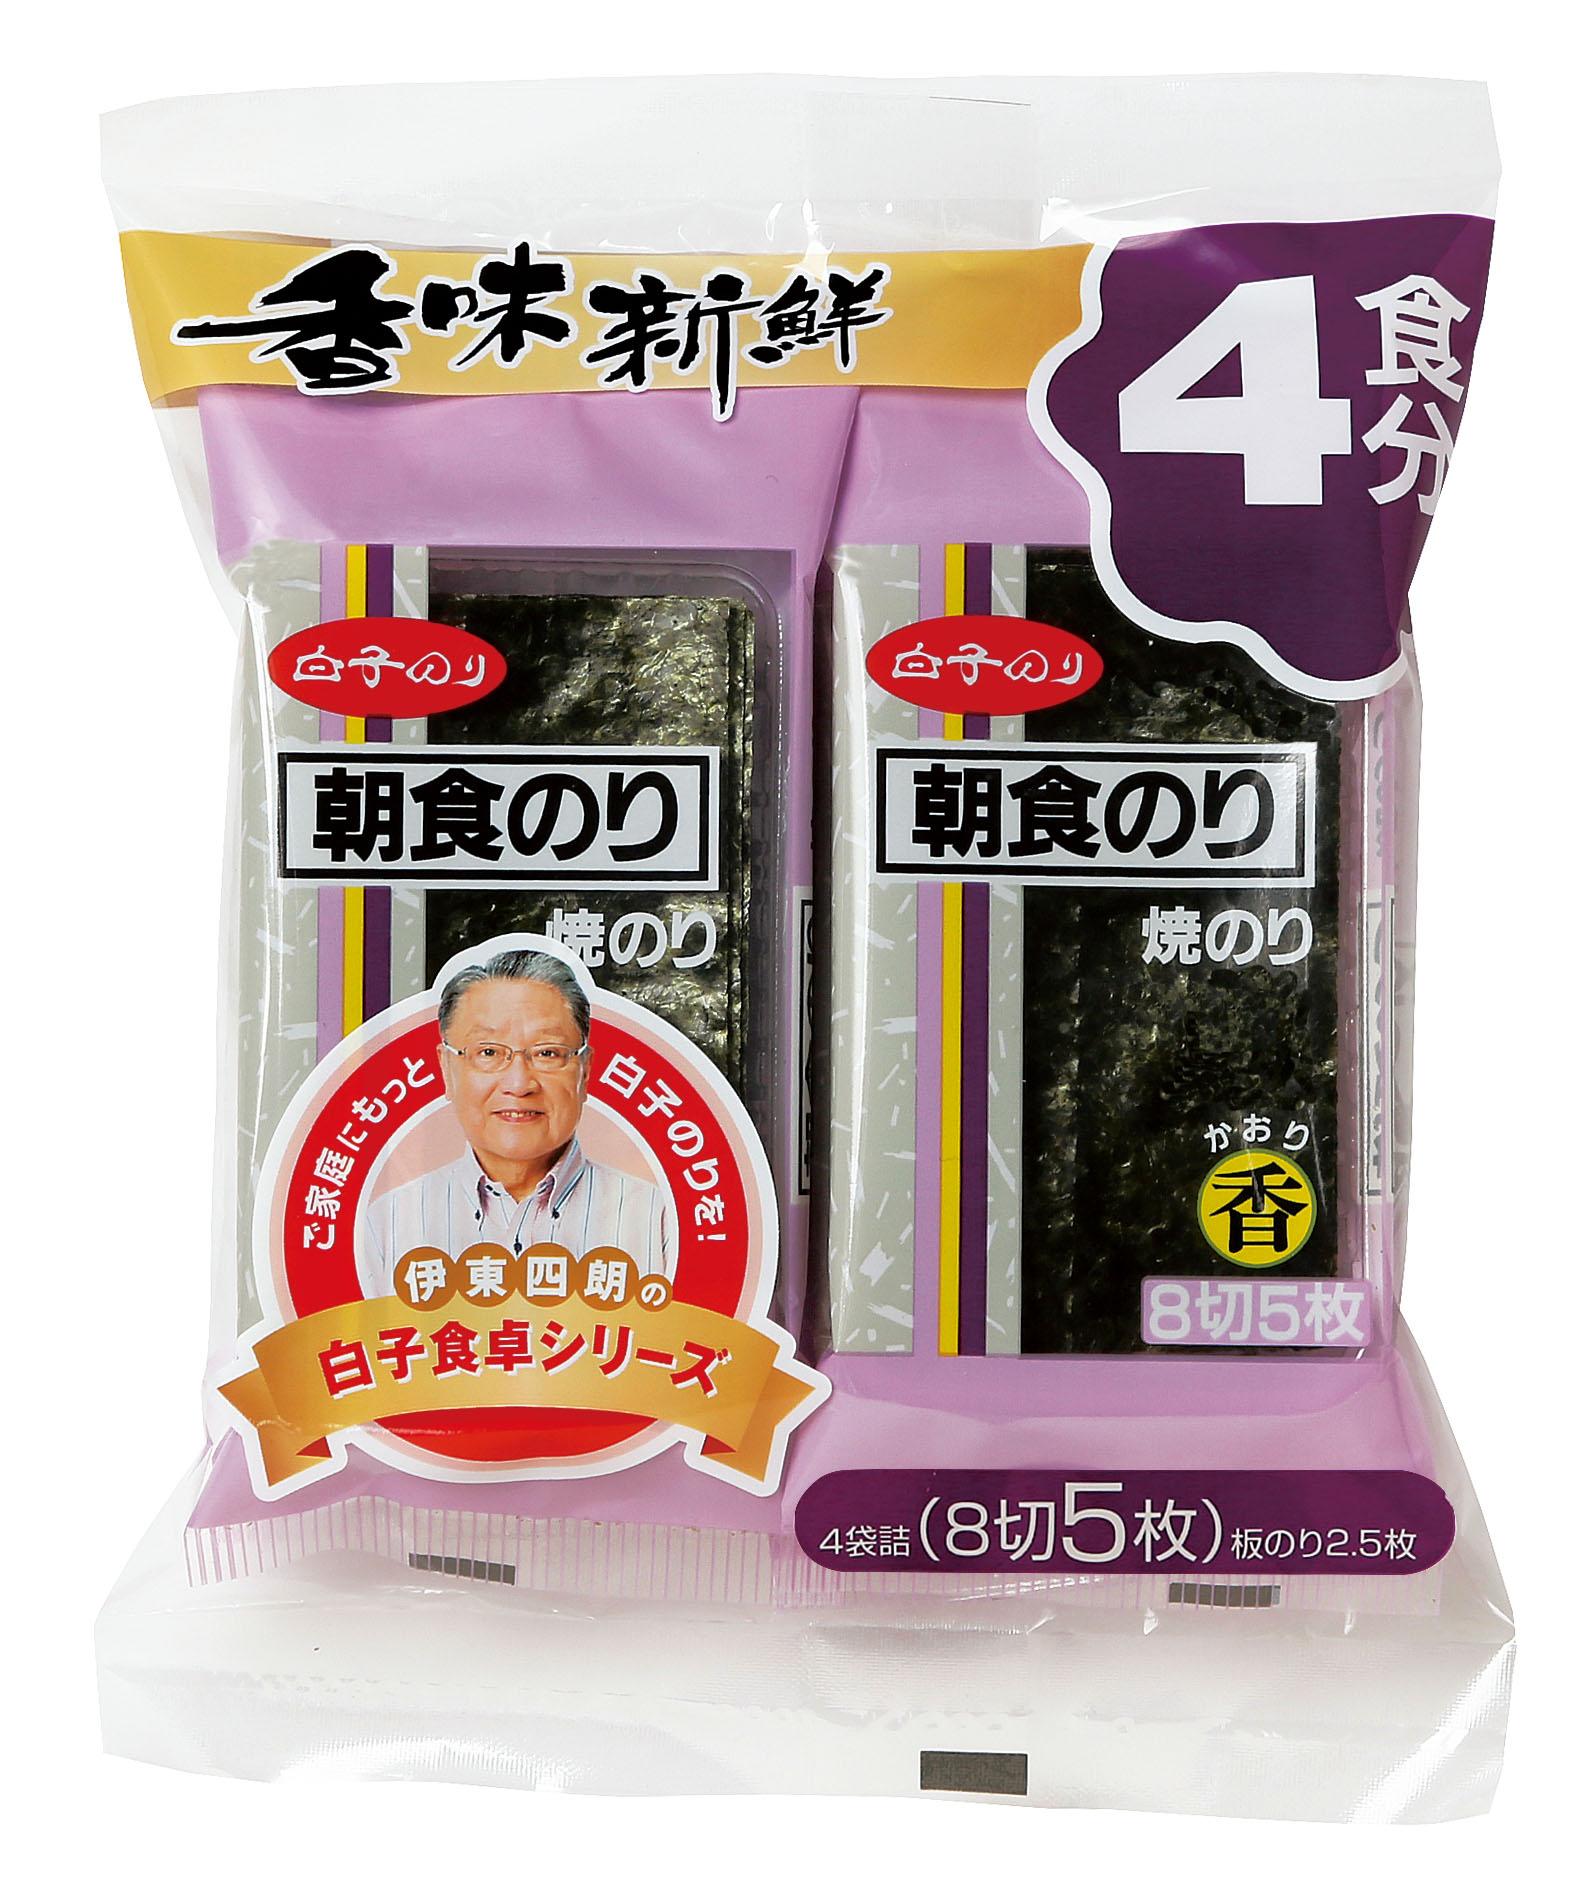 N焼朝食香4P